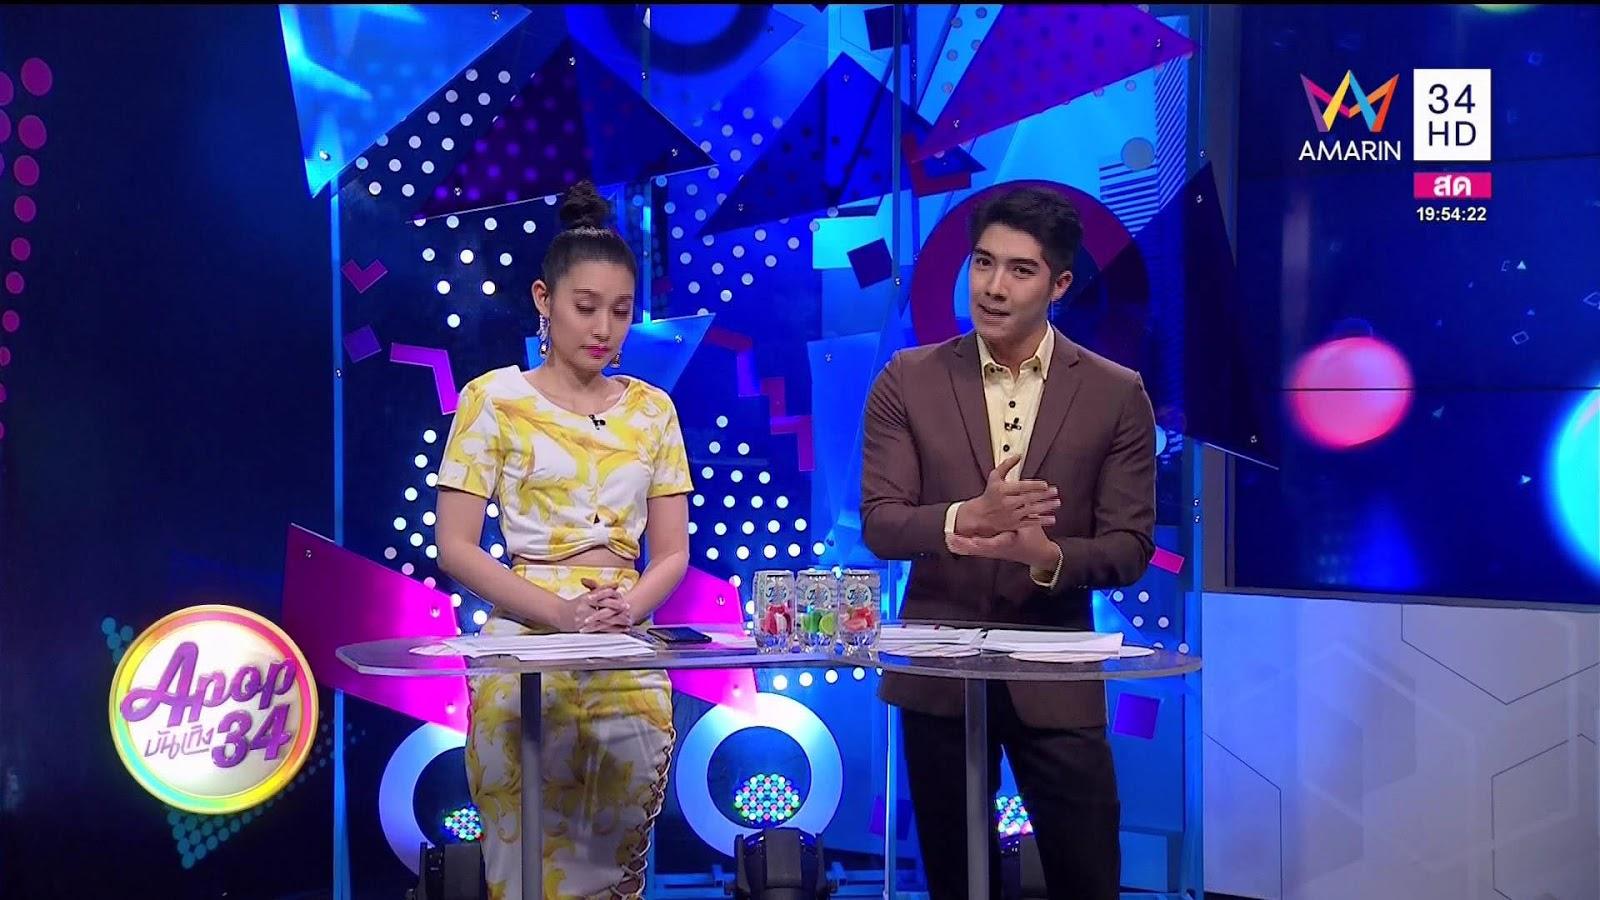 Frekuensi siaran Amarin TV HD di satelit Thaicom 6 Terbaru